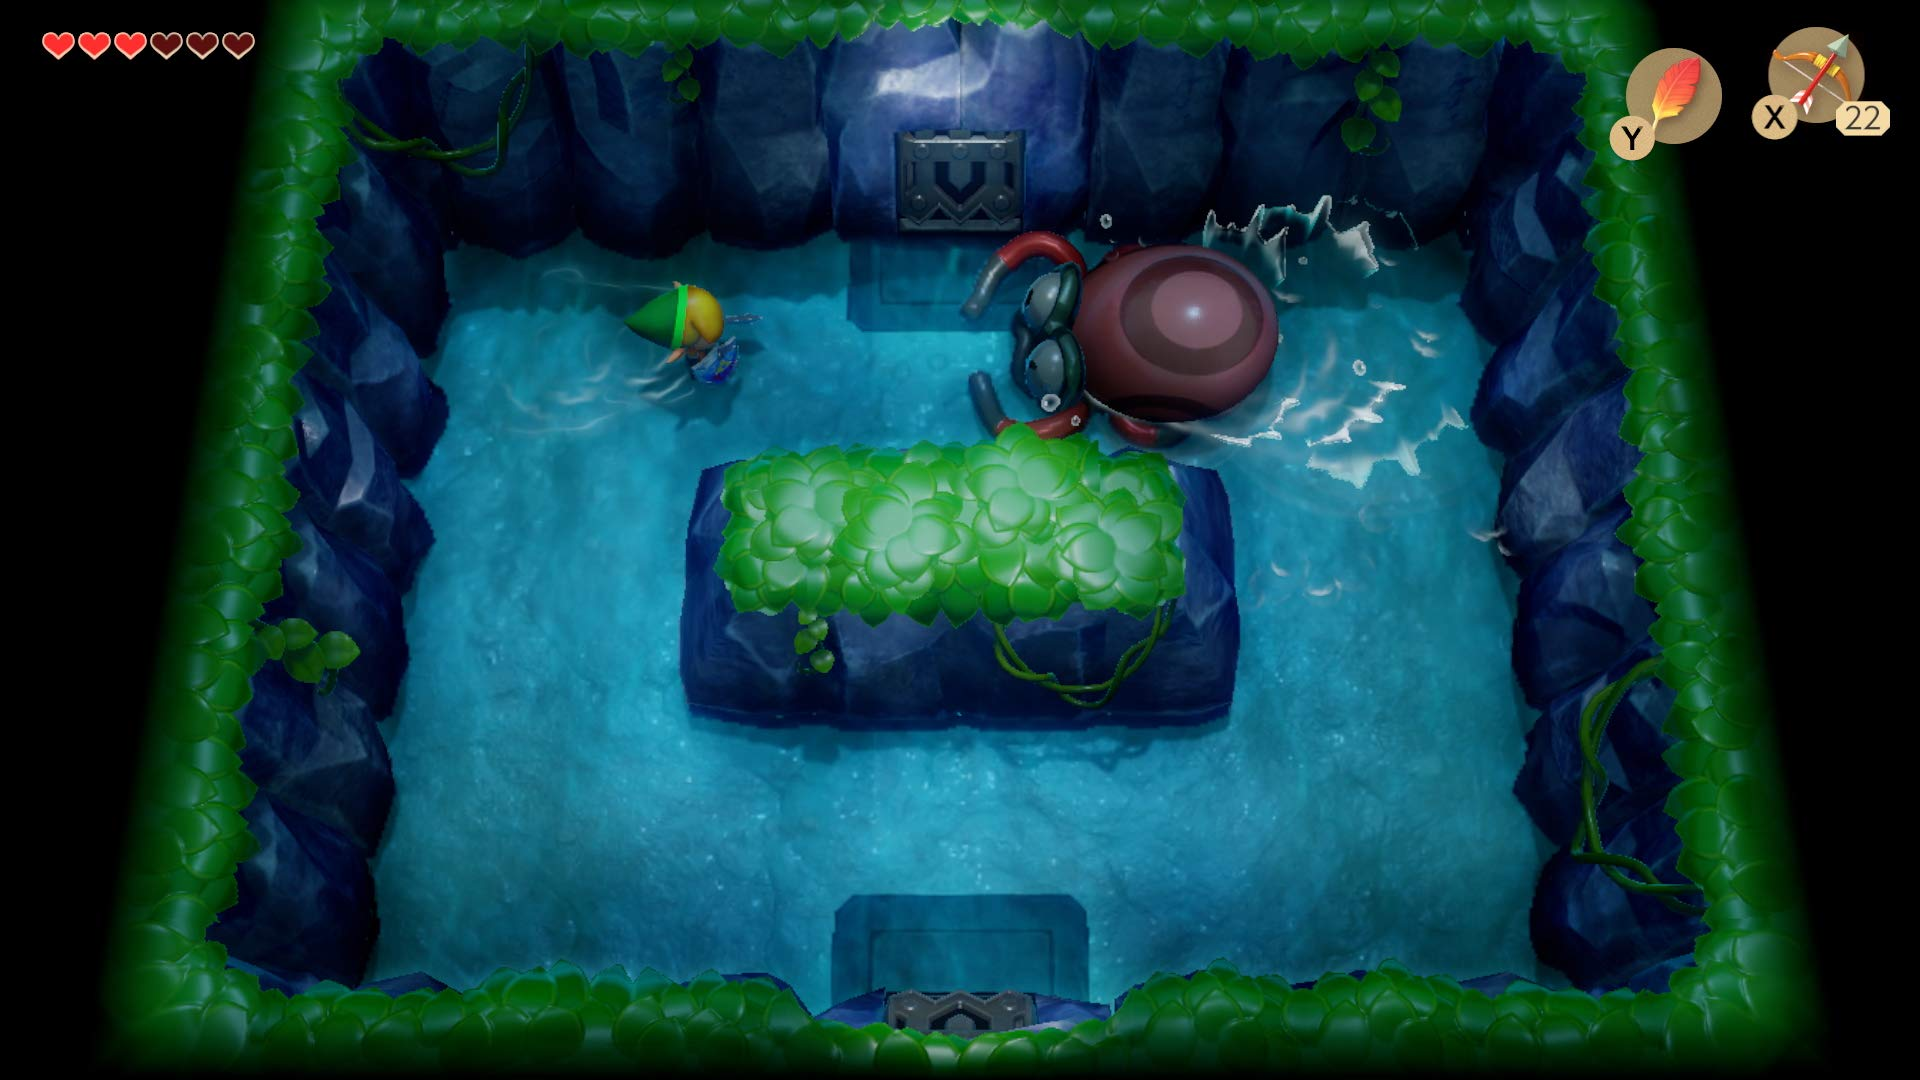 Legend of Zelda Link's Awakening - Nintendo Switch by Nintendo (Image #11)